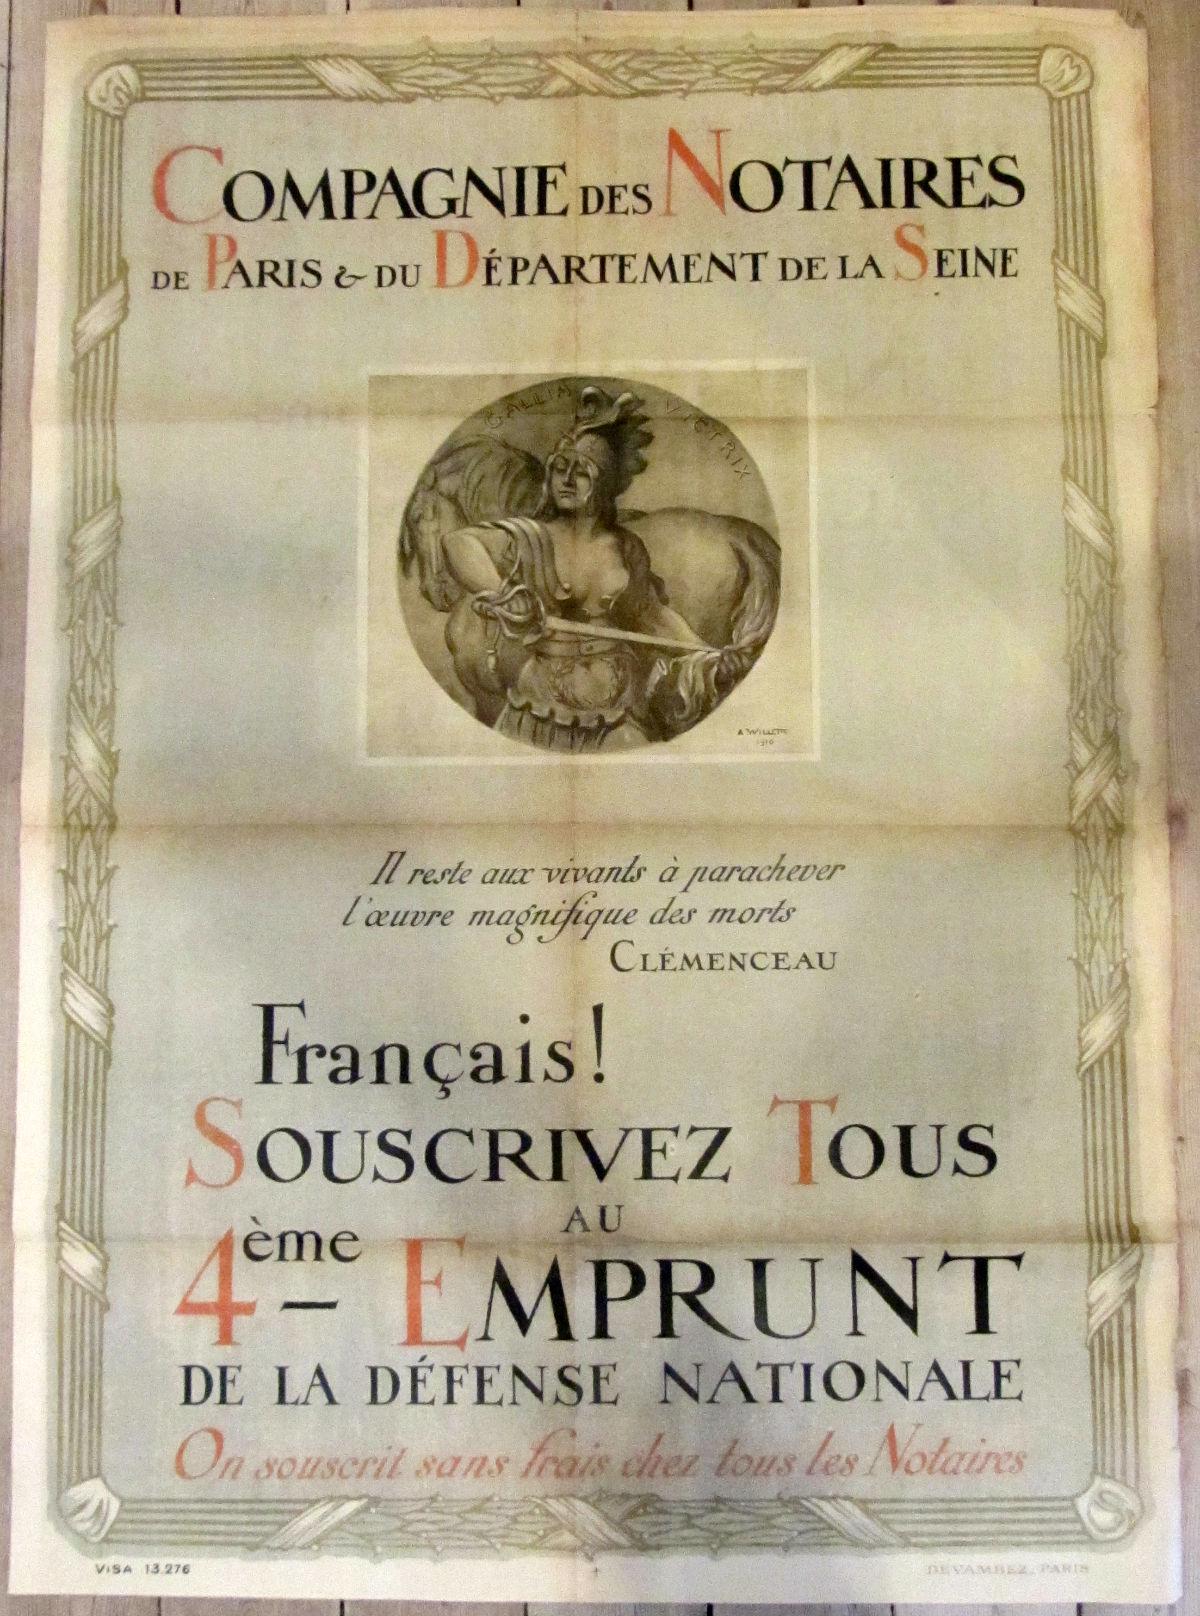 Compagnie des Notaries - vintage poster - risom.dk